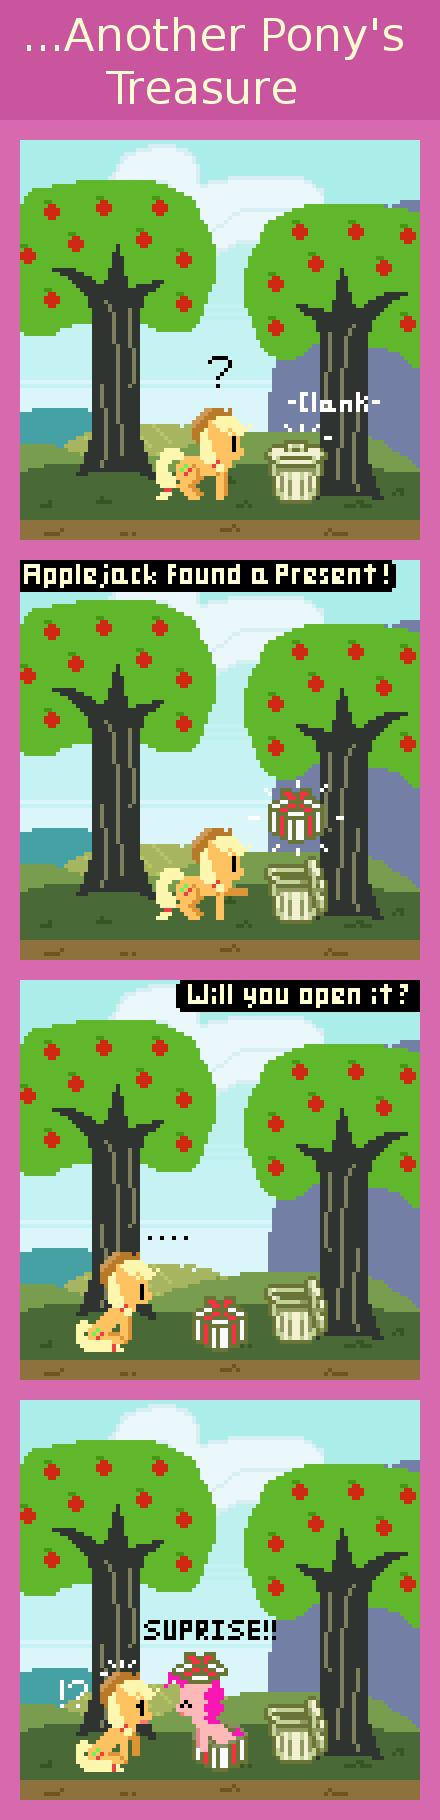 ...Another Pony's Treasure. via zztfox.deviantart.com/art/Another-Pony-s-Treasure-370735518?q=gallery%3Azztfox&qo=0 You found a Pinkie Pie inside! Will you keep